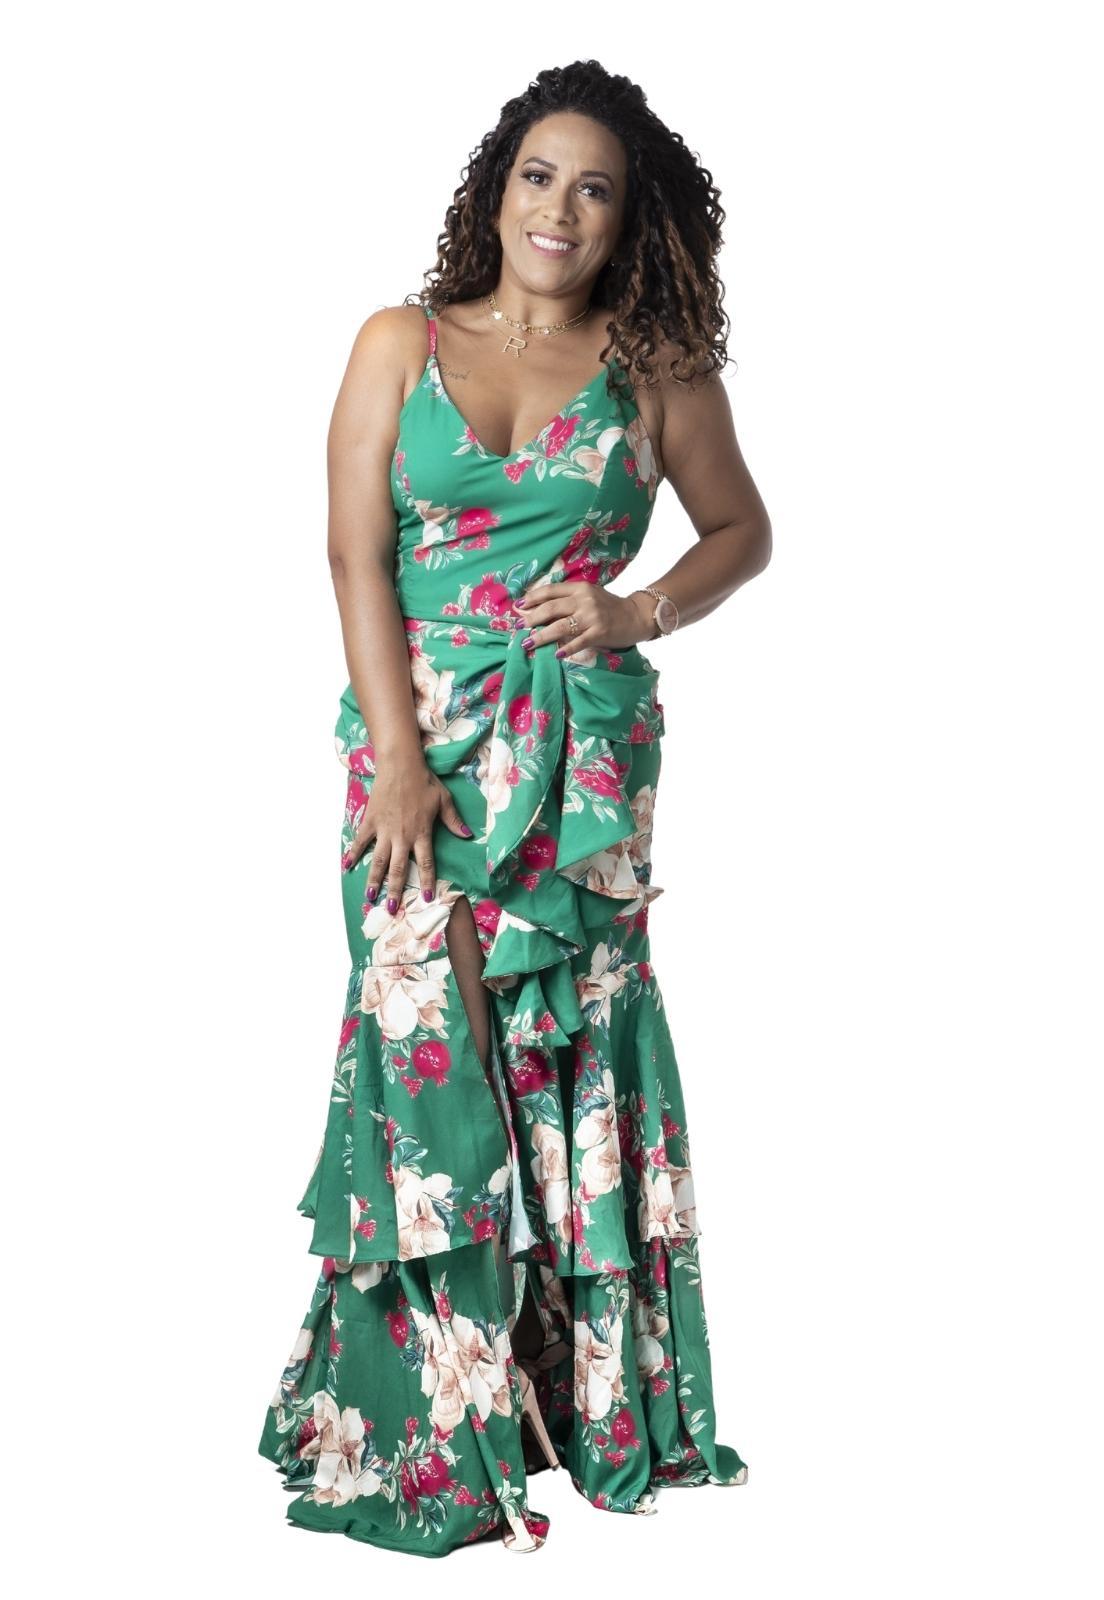 Vestido Feminino Festa Estampa Floral Assimétrico Babado